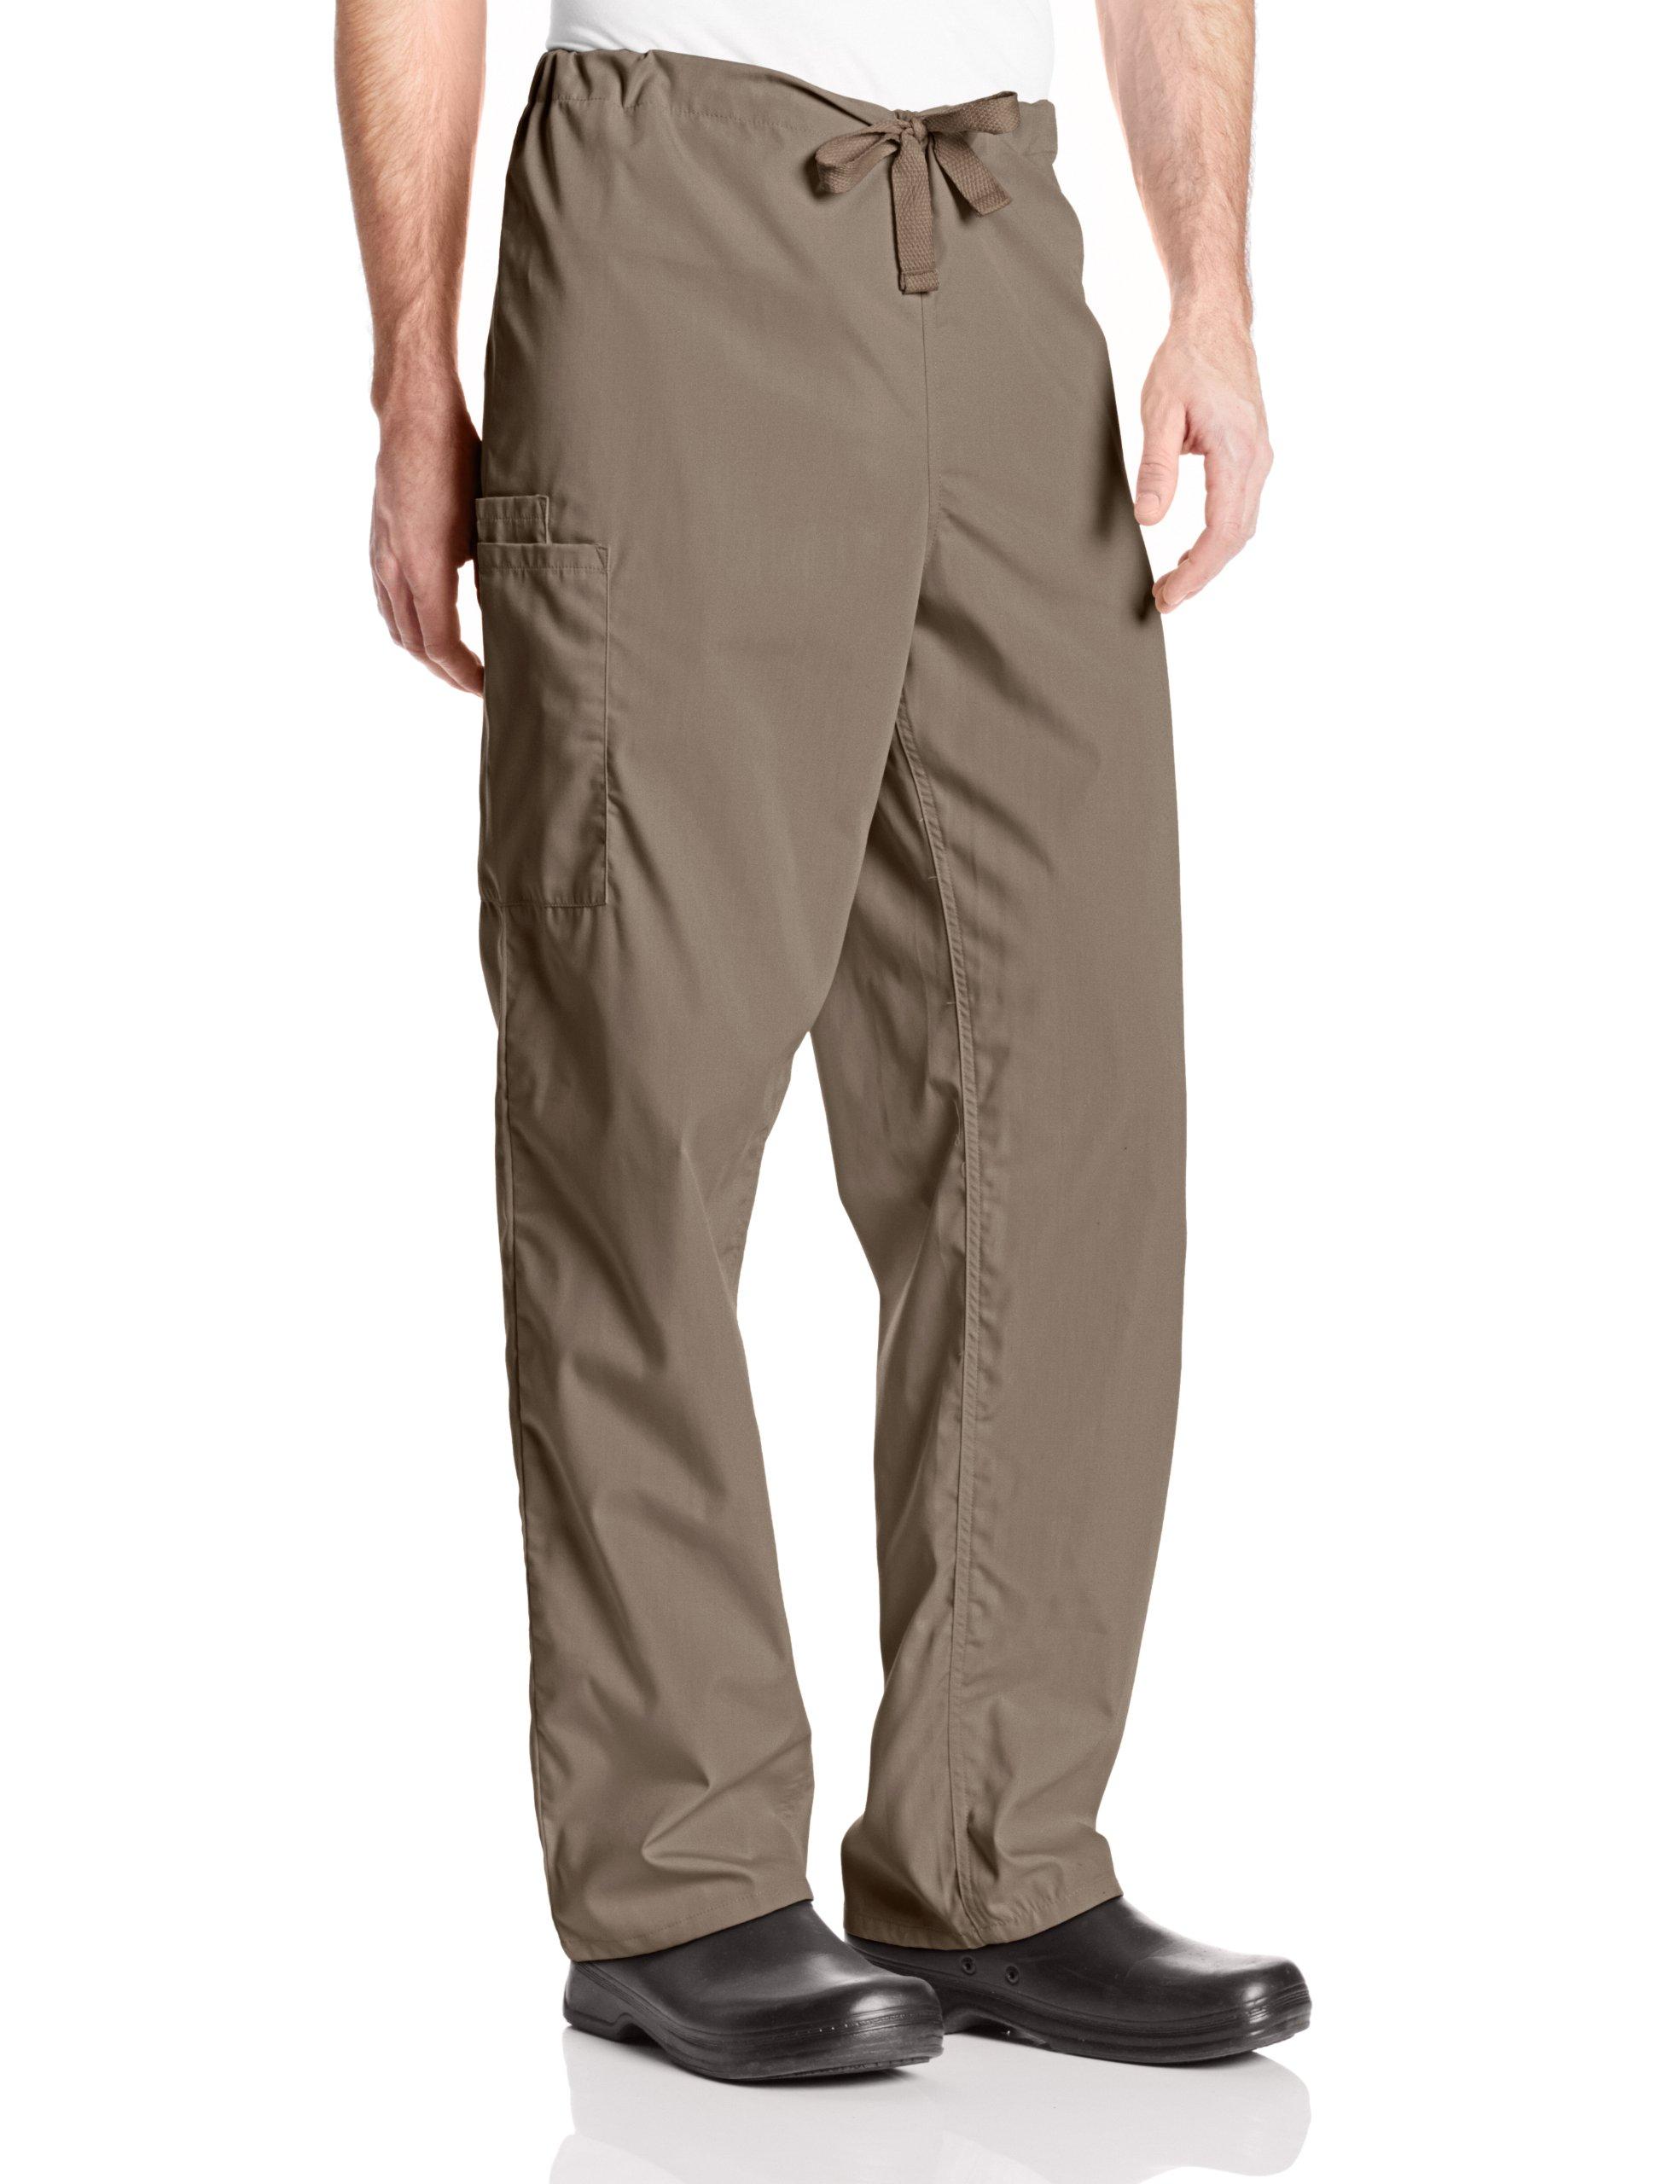 Cherokee Workwear Scrubs Unisex Cargo Pant, Taupe, X-Large/Tall